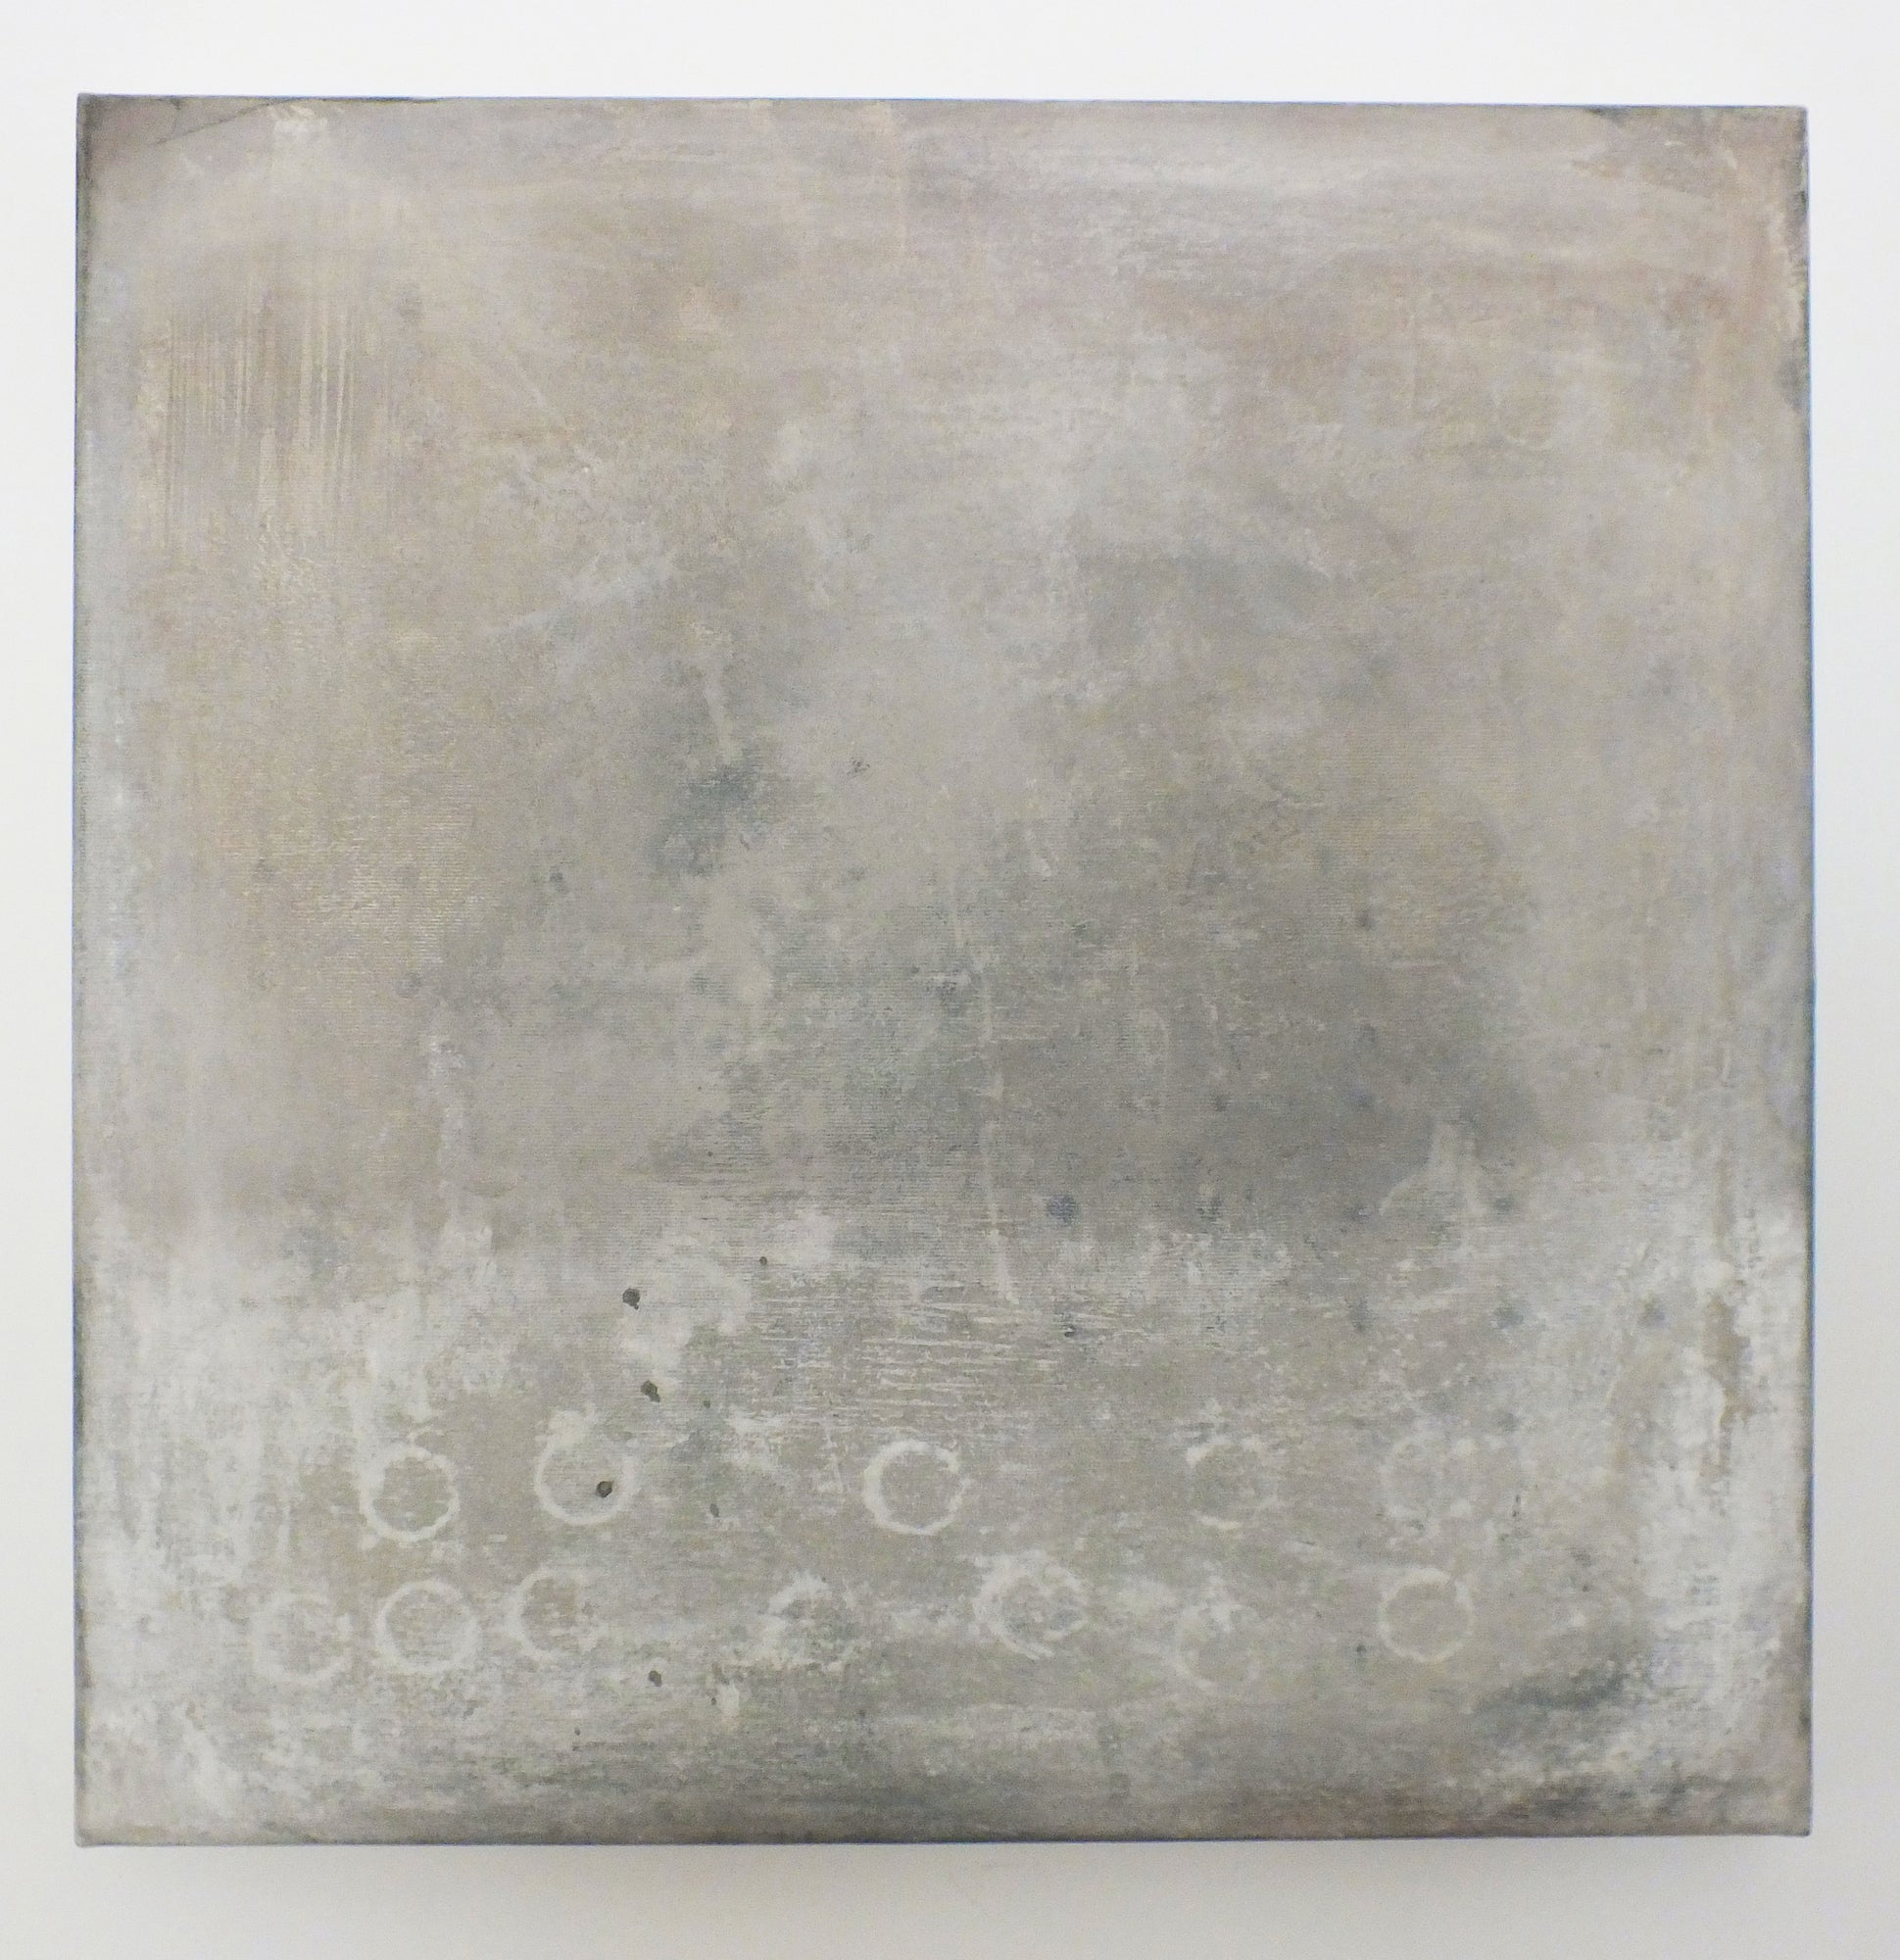 Landscape 57, Contemporary Minimalist Art Abstract Mixed Media Canvas Gray Grey